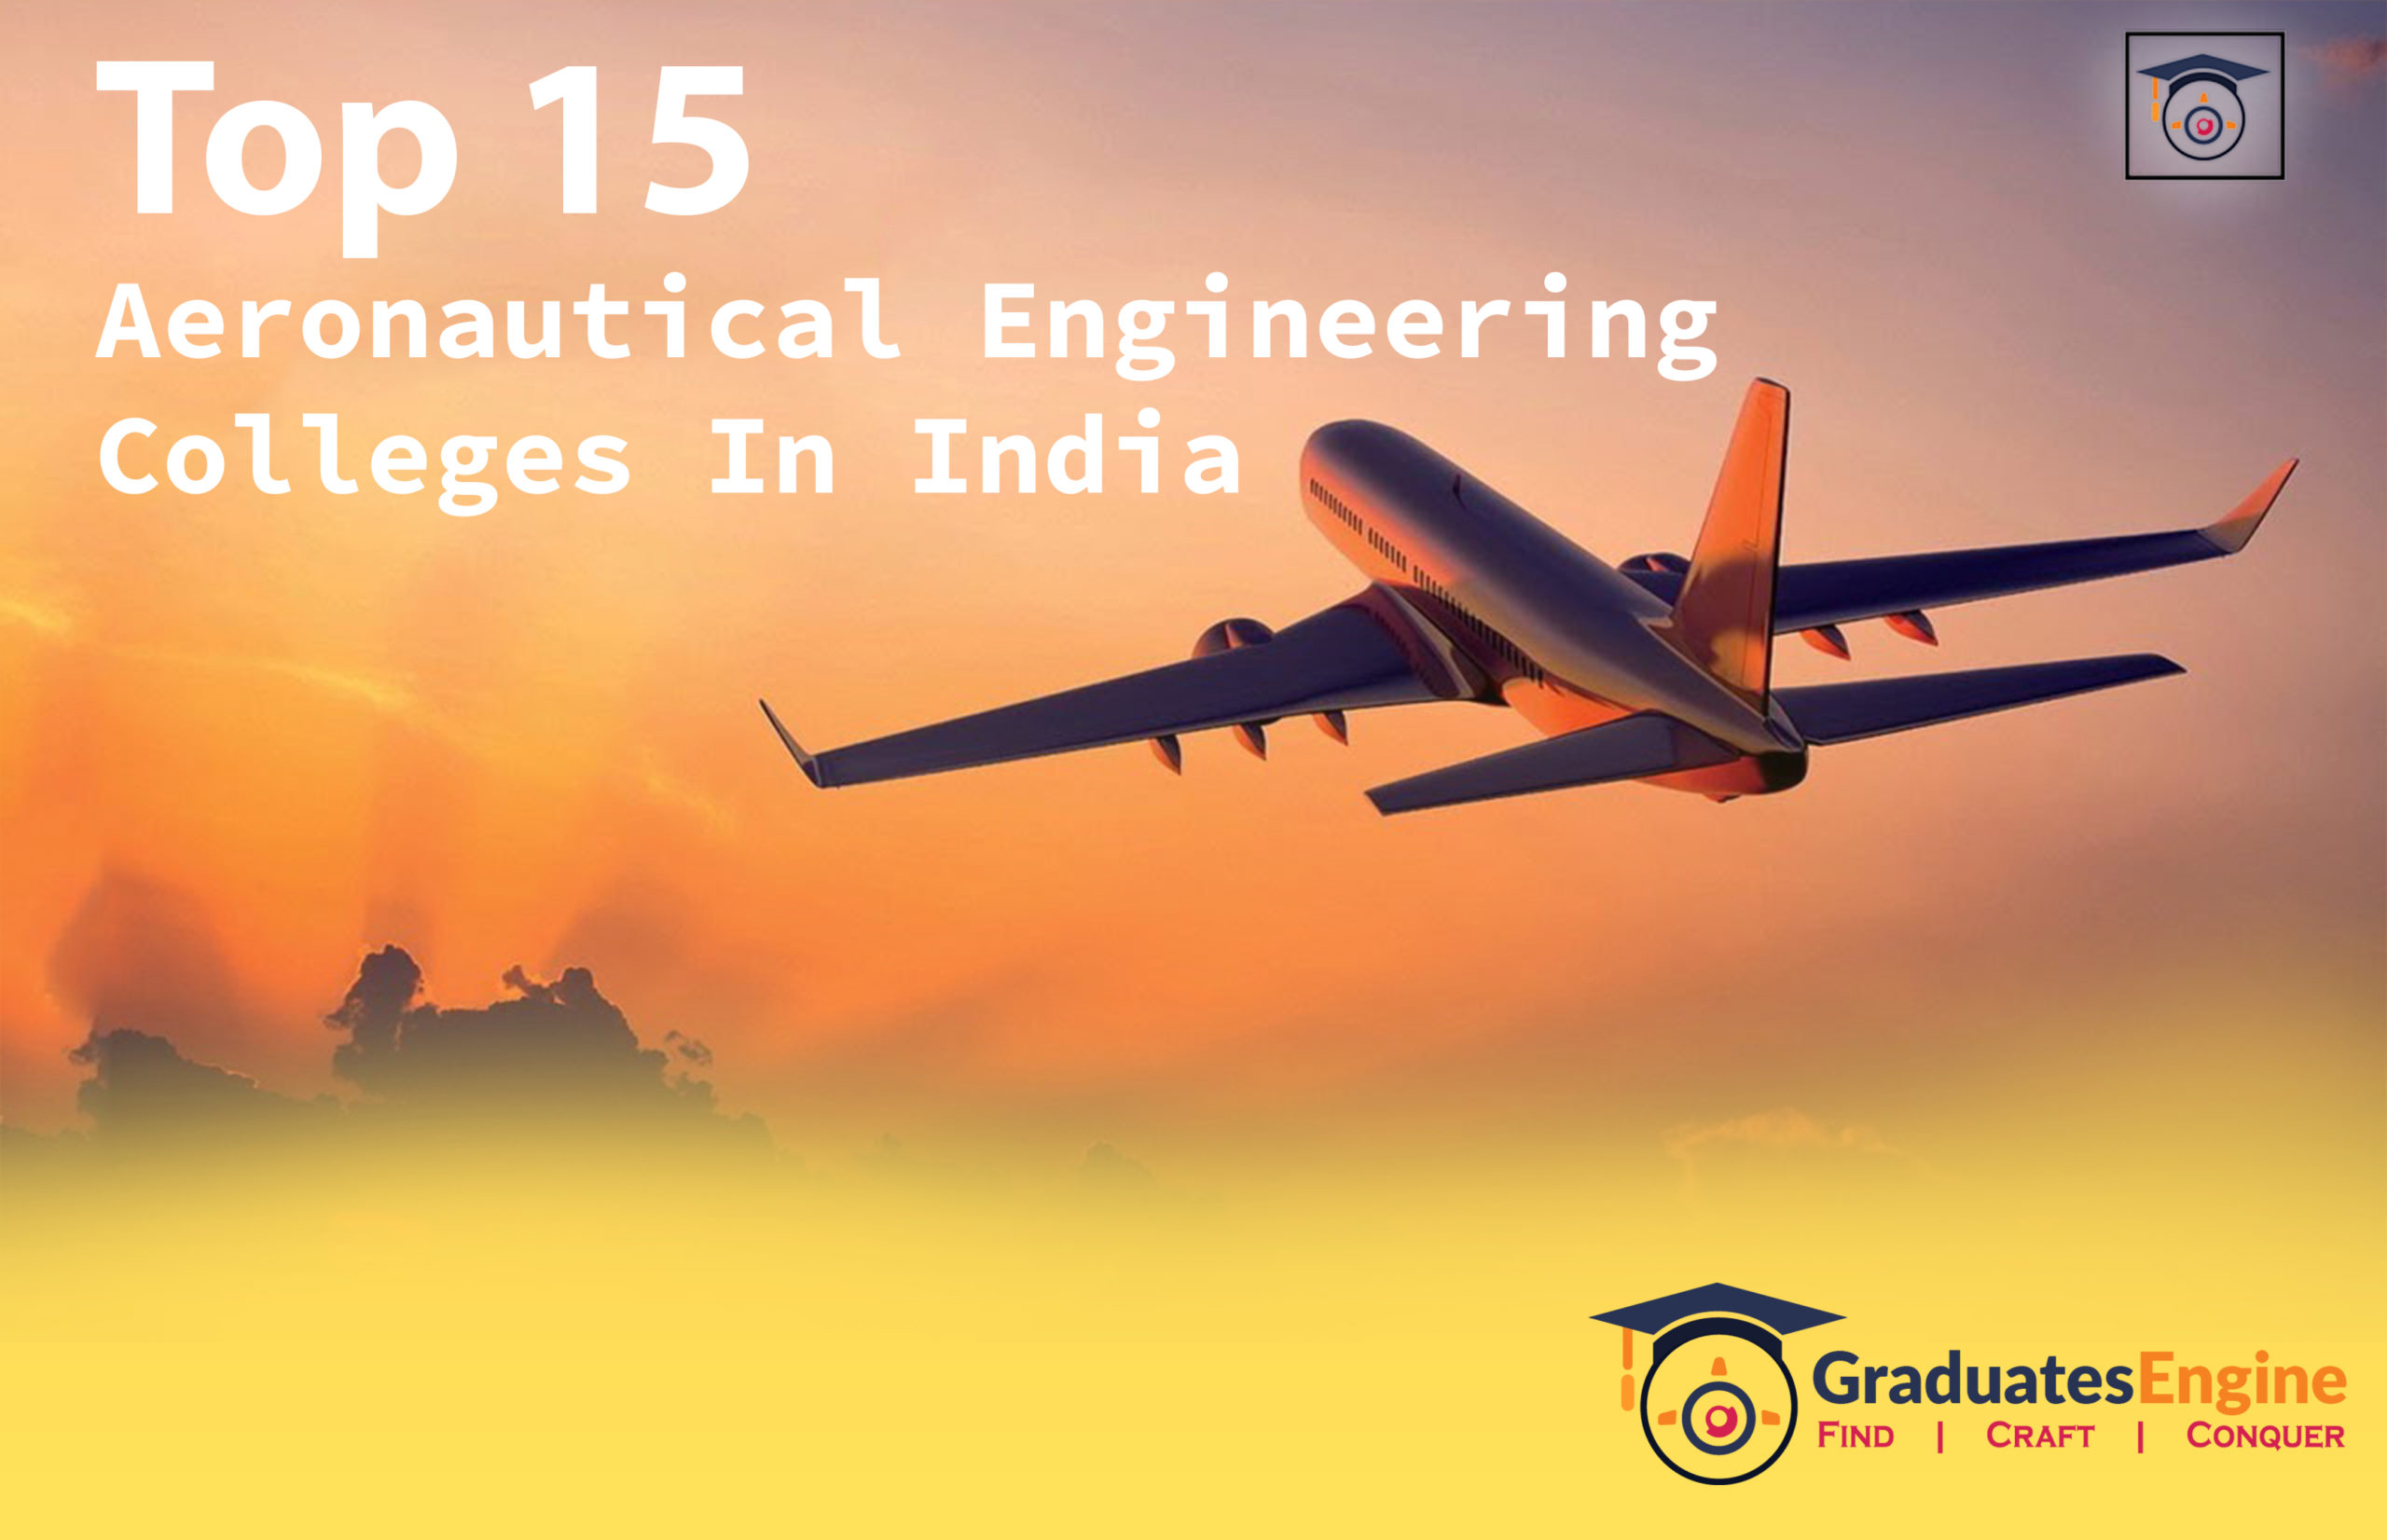 Top 15 aeronautical engineering colleges in India